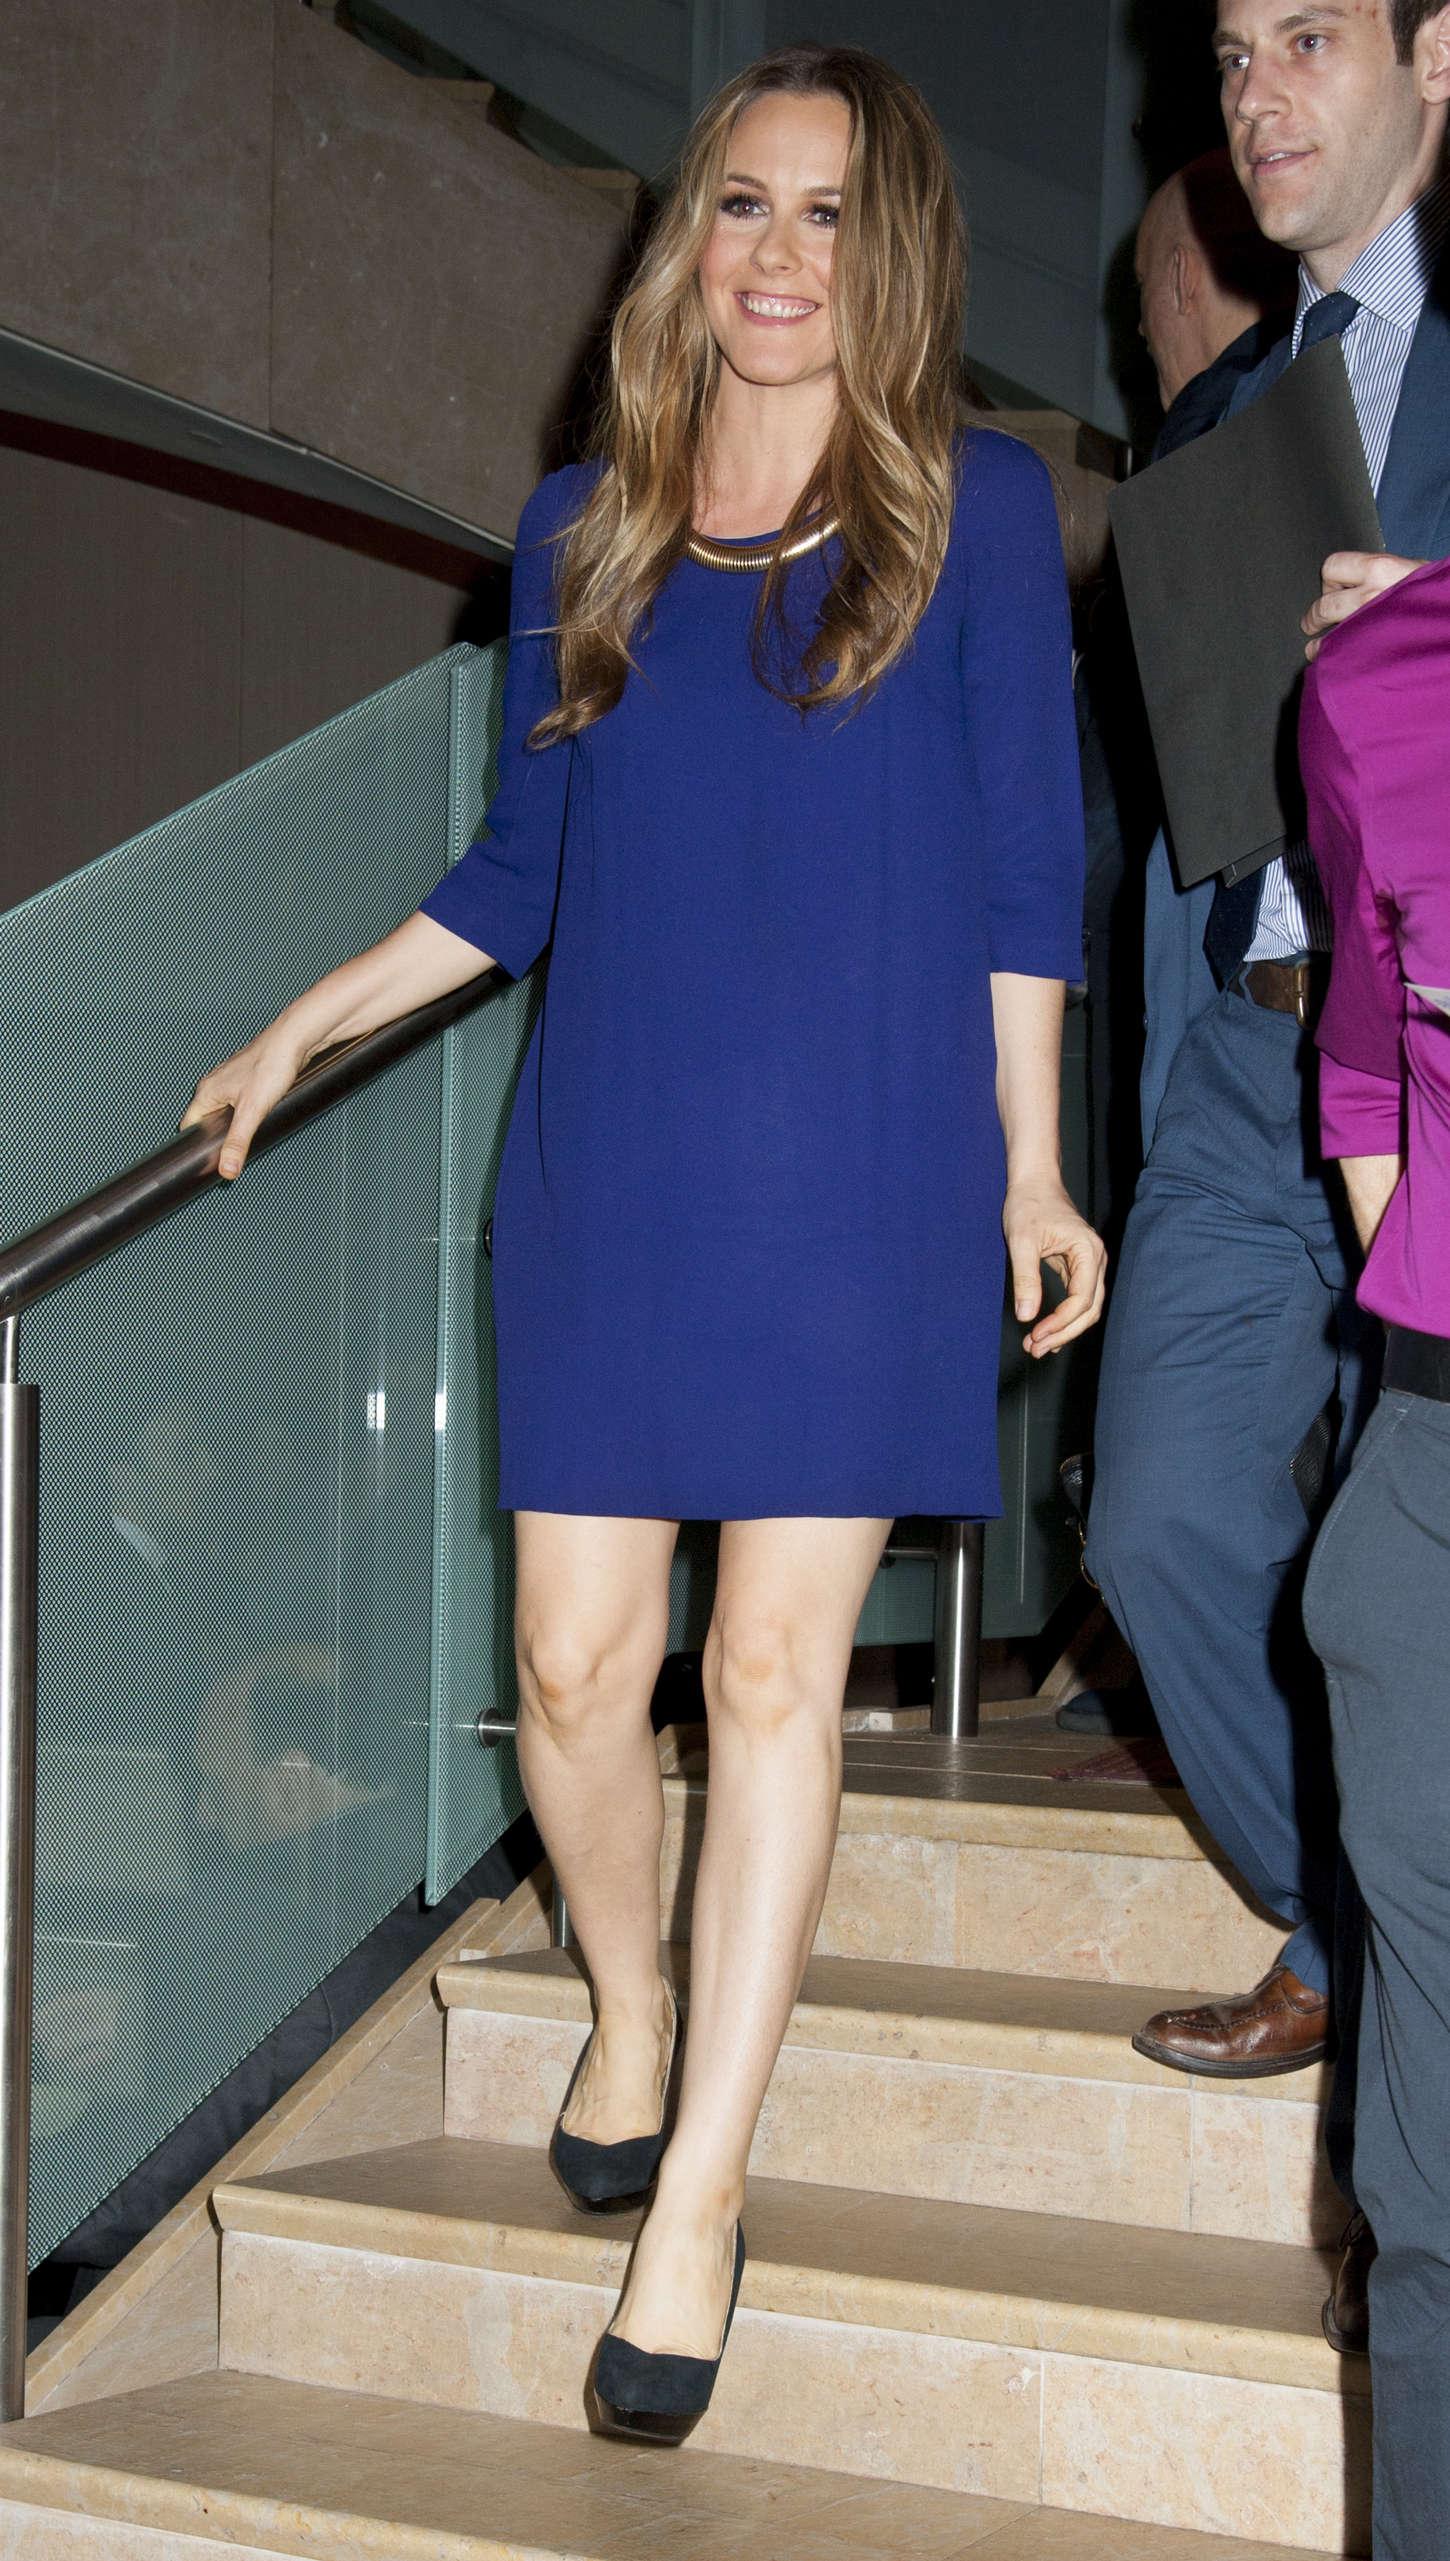 Alicia Silverstone Annual Lucille Lortel Awards in New York